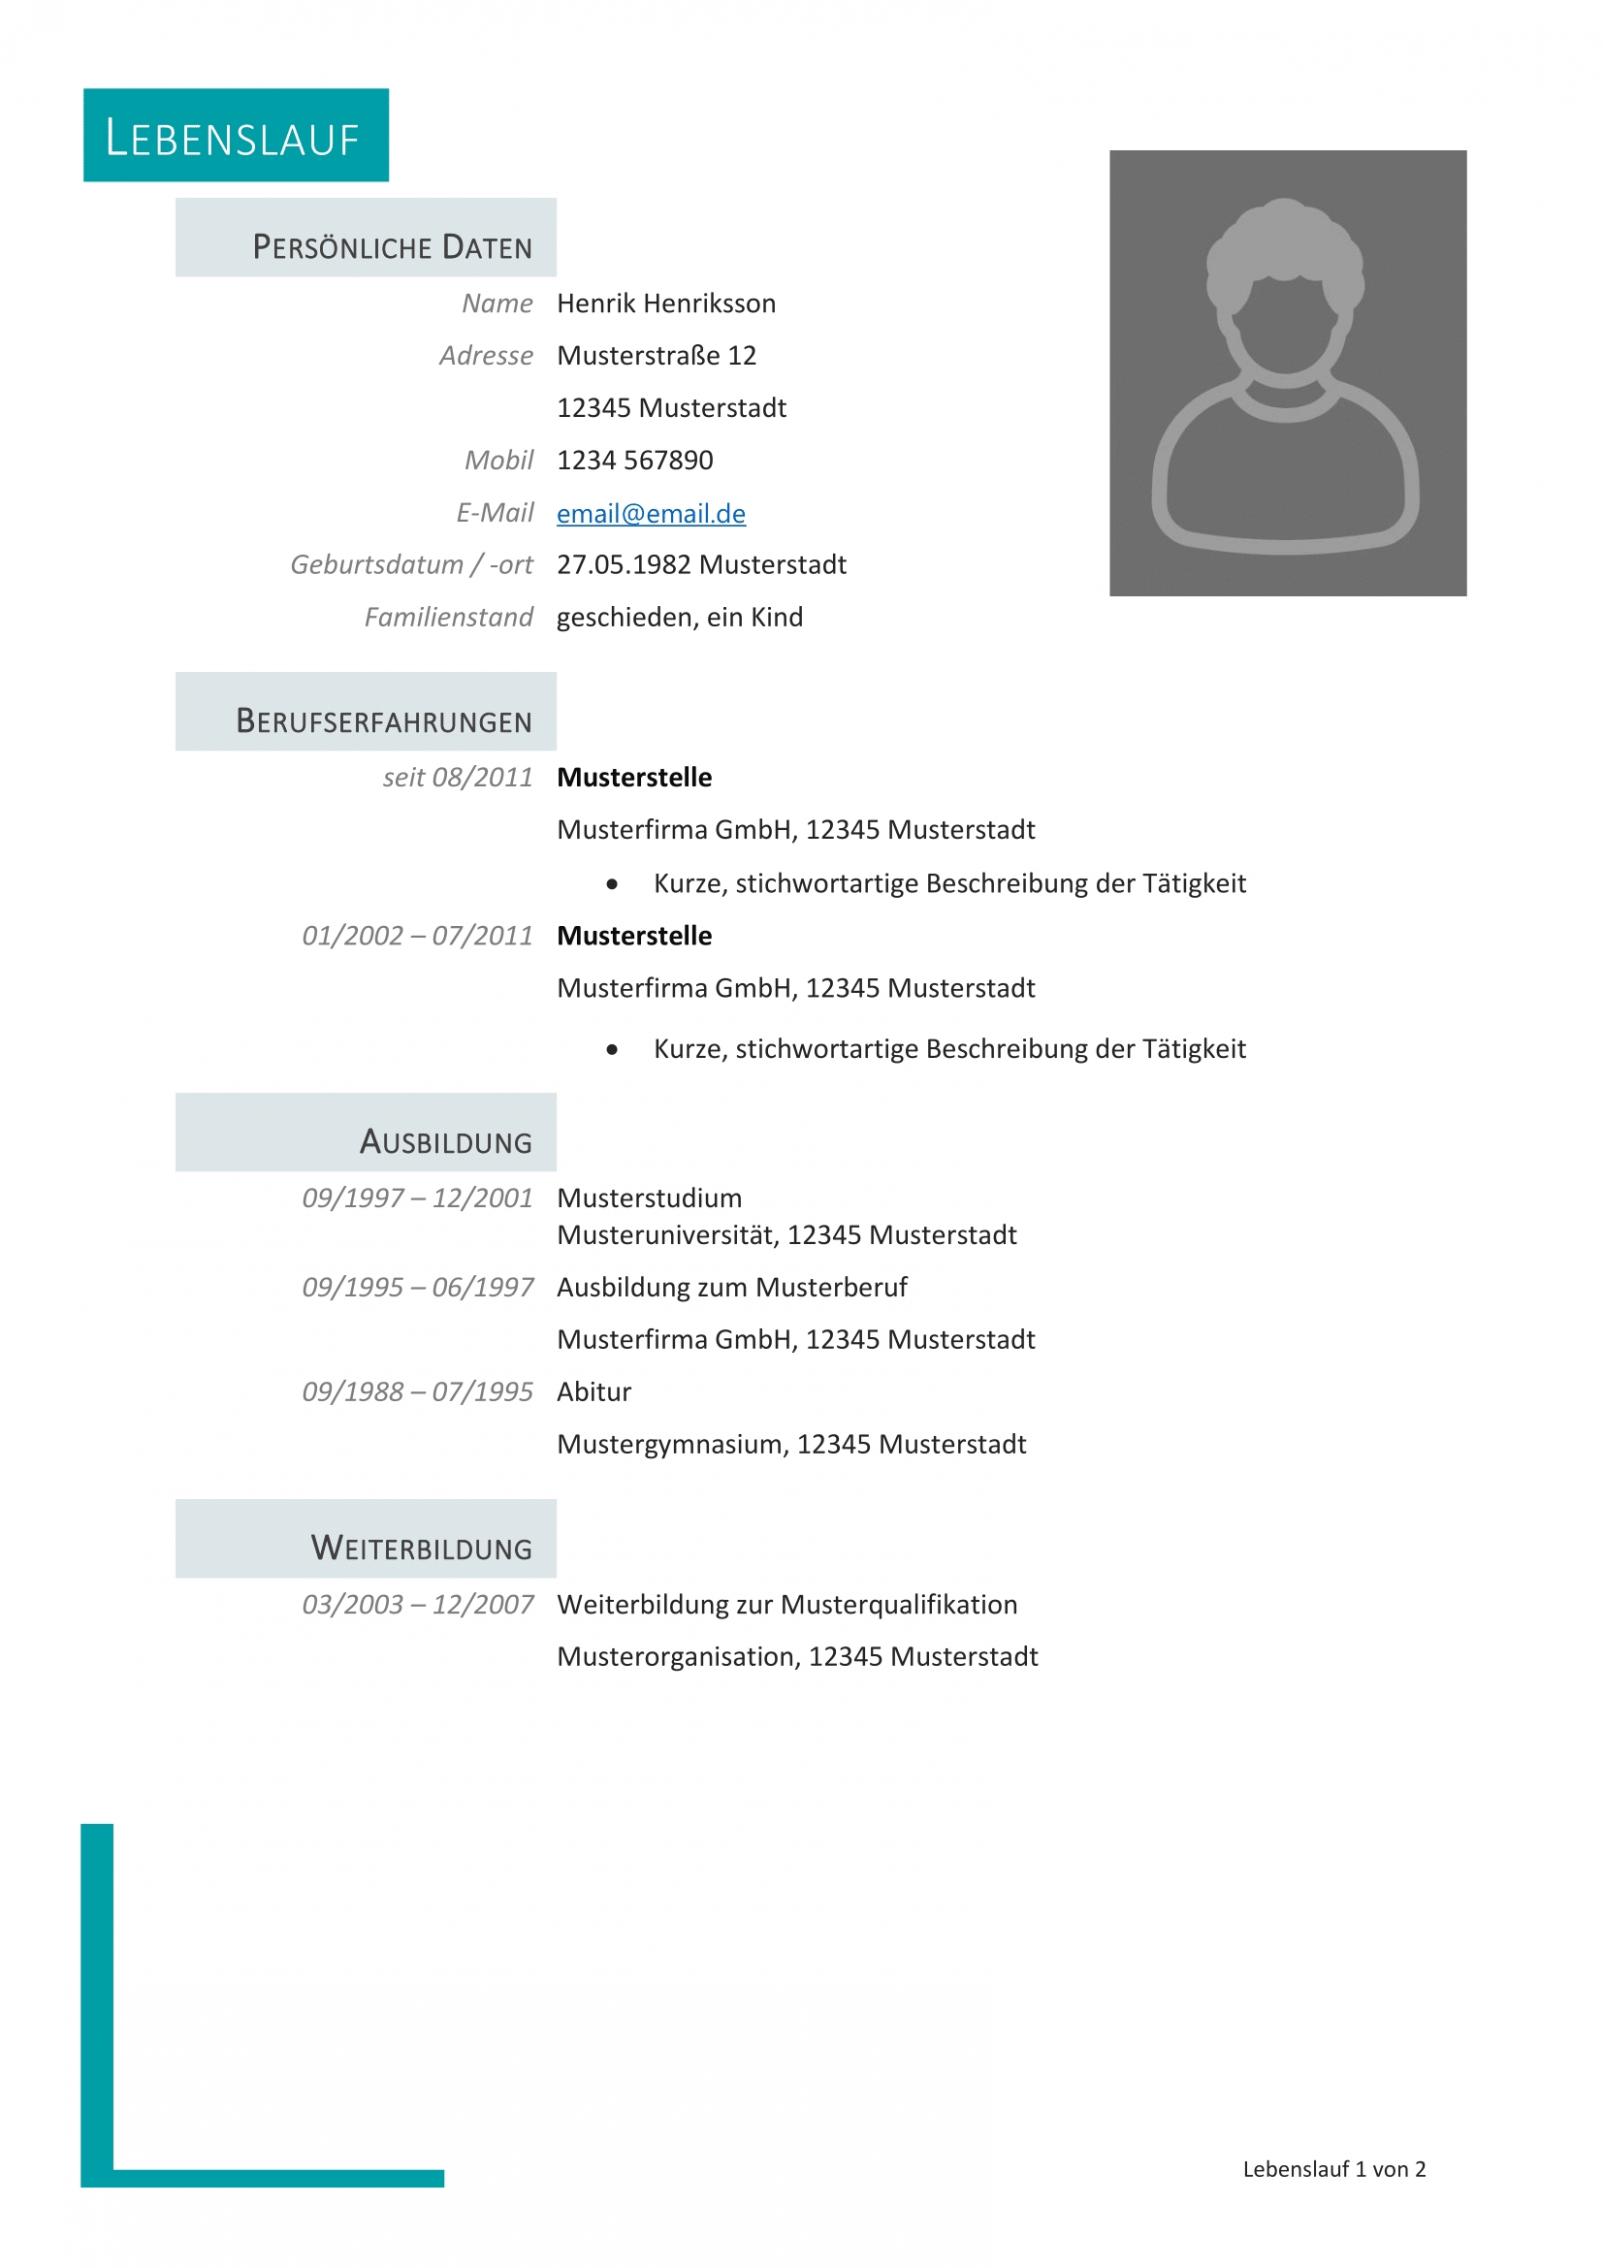 3 Bewerbungsschreiben Nach Der Schule Muster In 2020 Resume Words Resume Examples Types Of Resumes